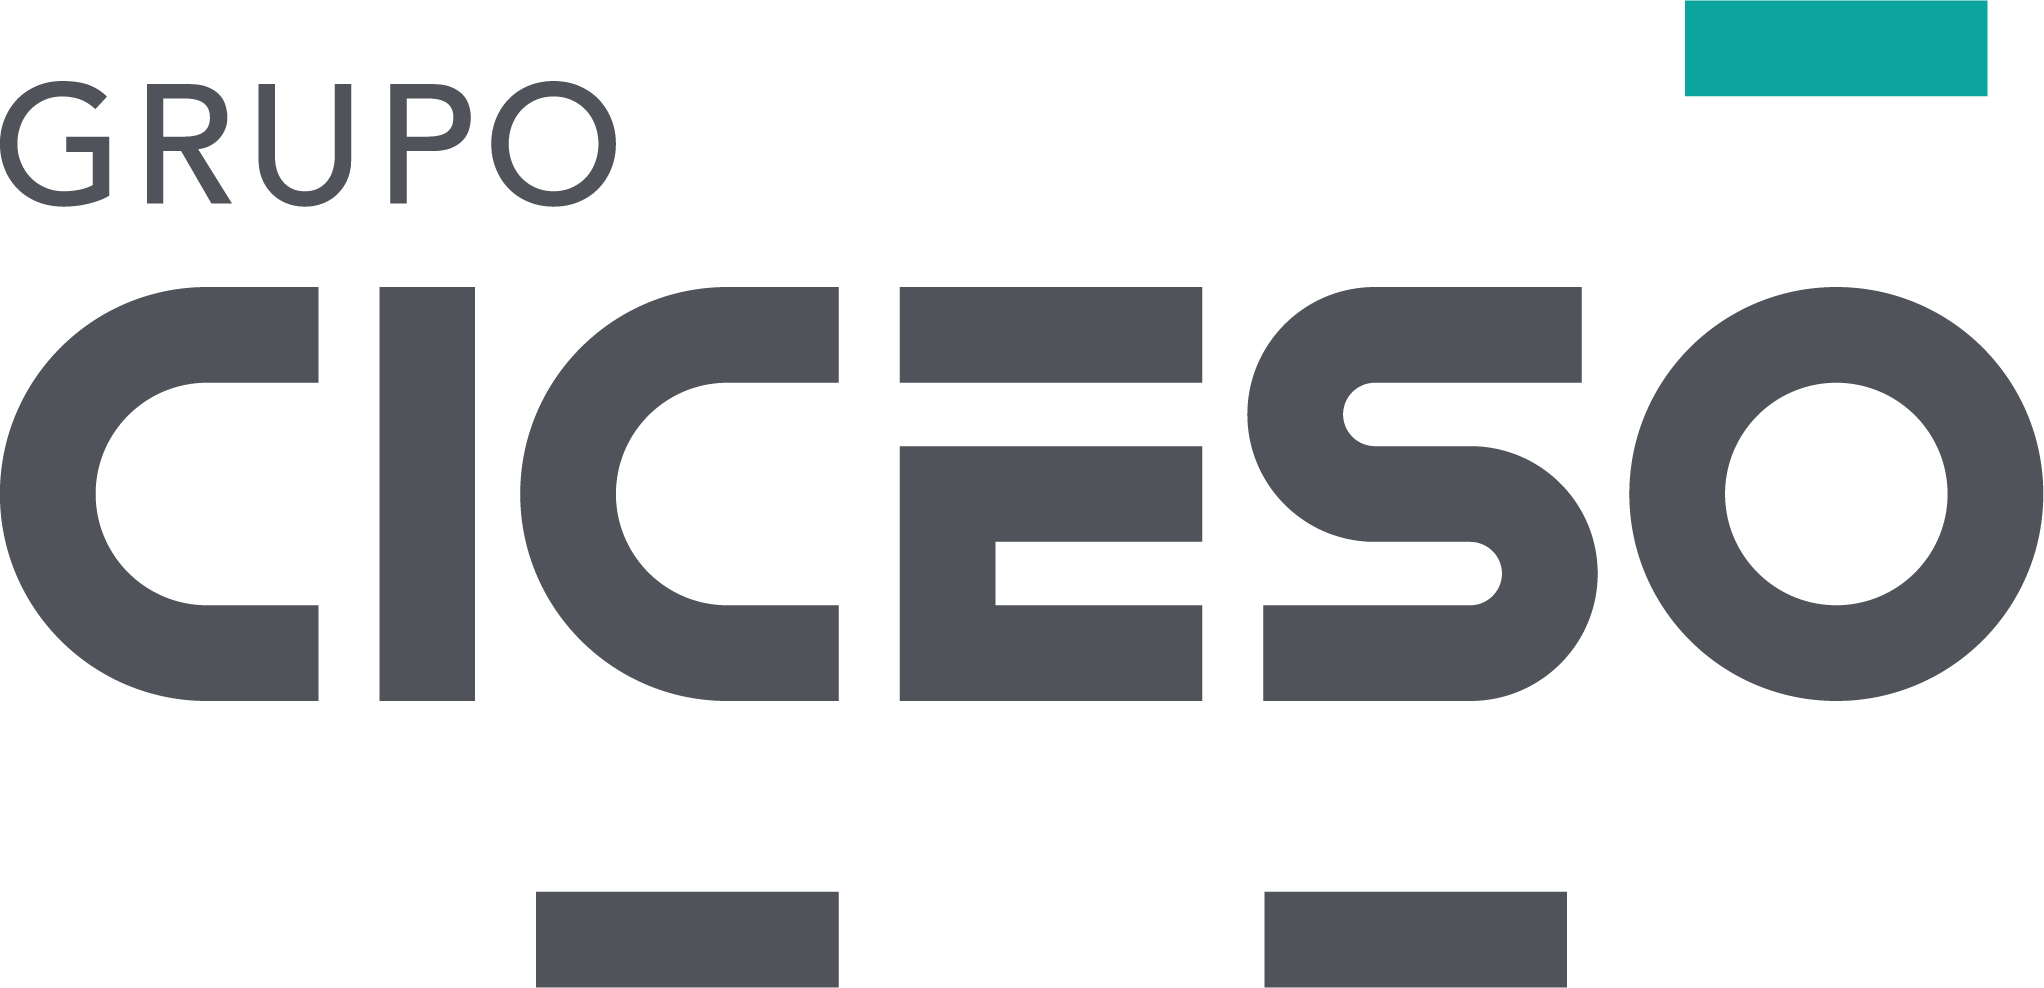 Grupo CICESO